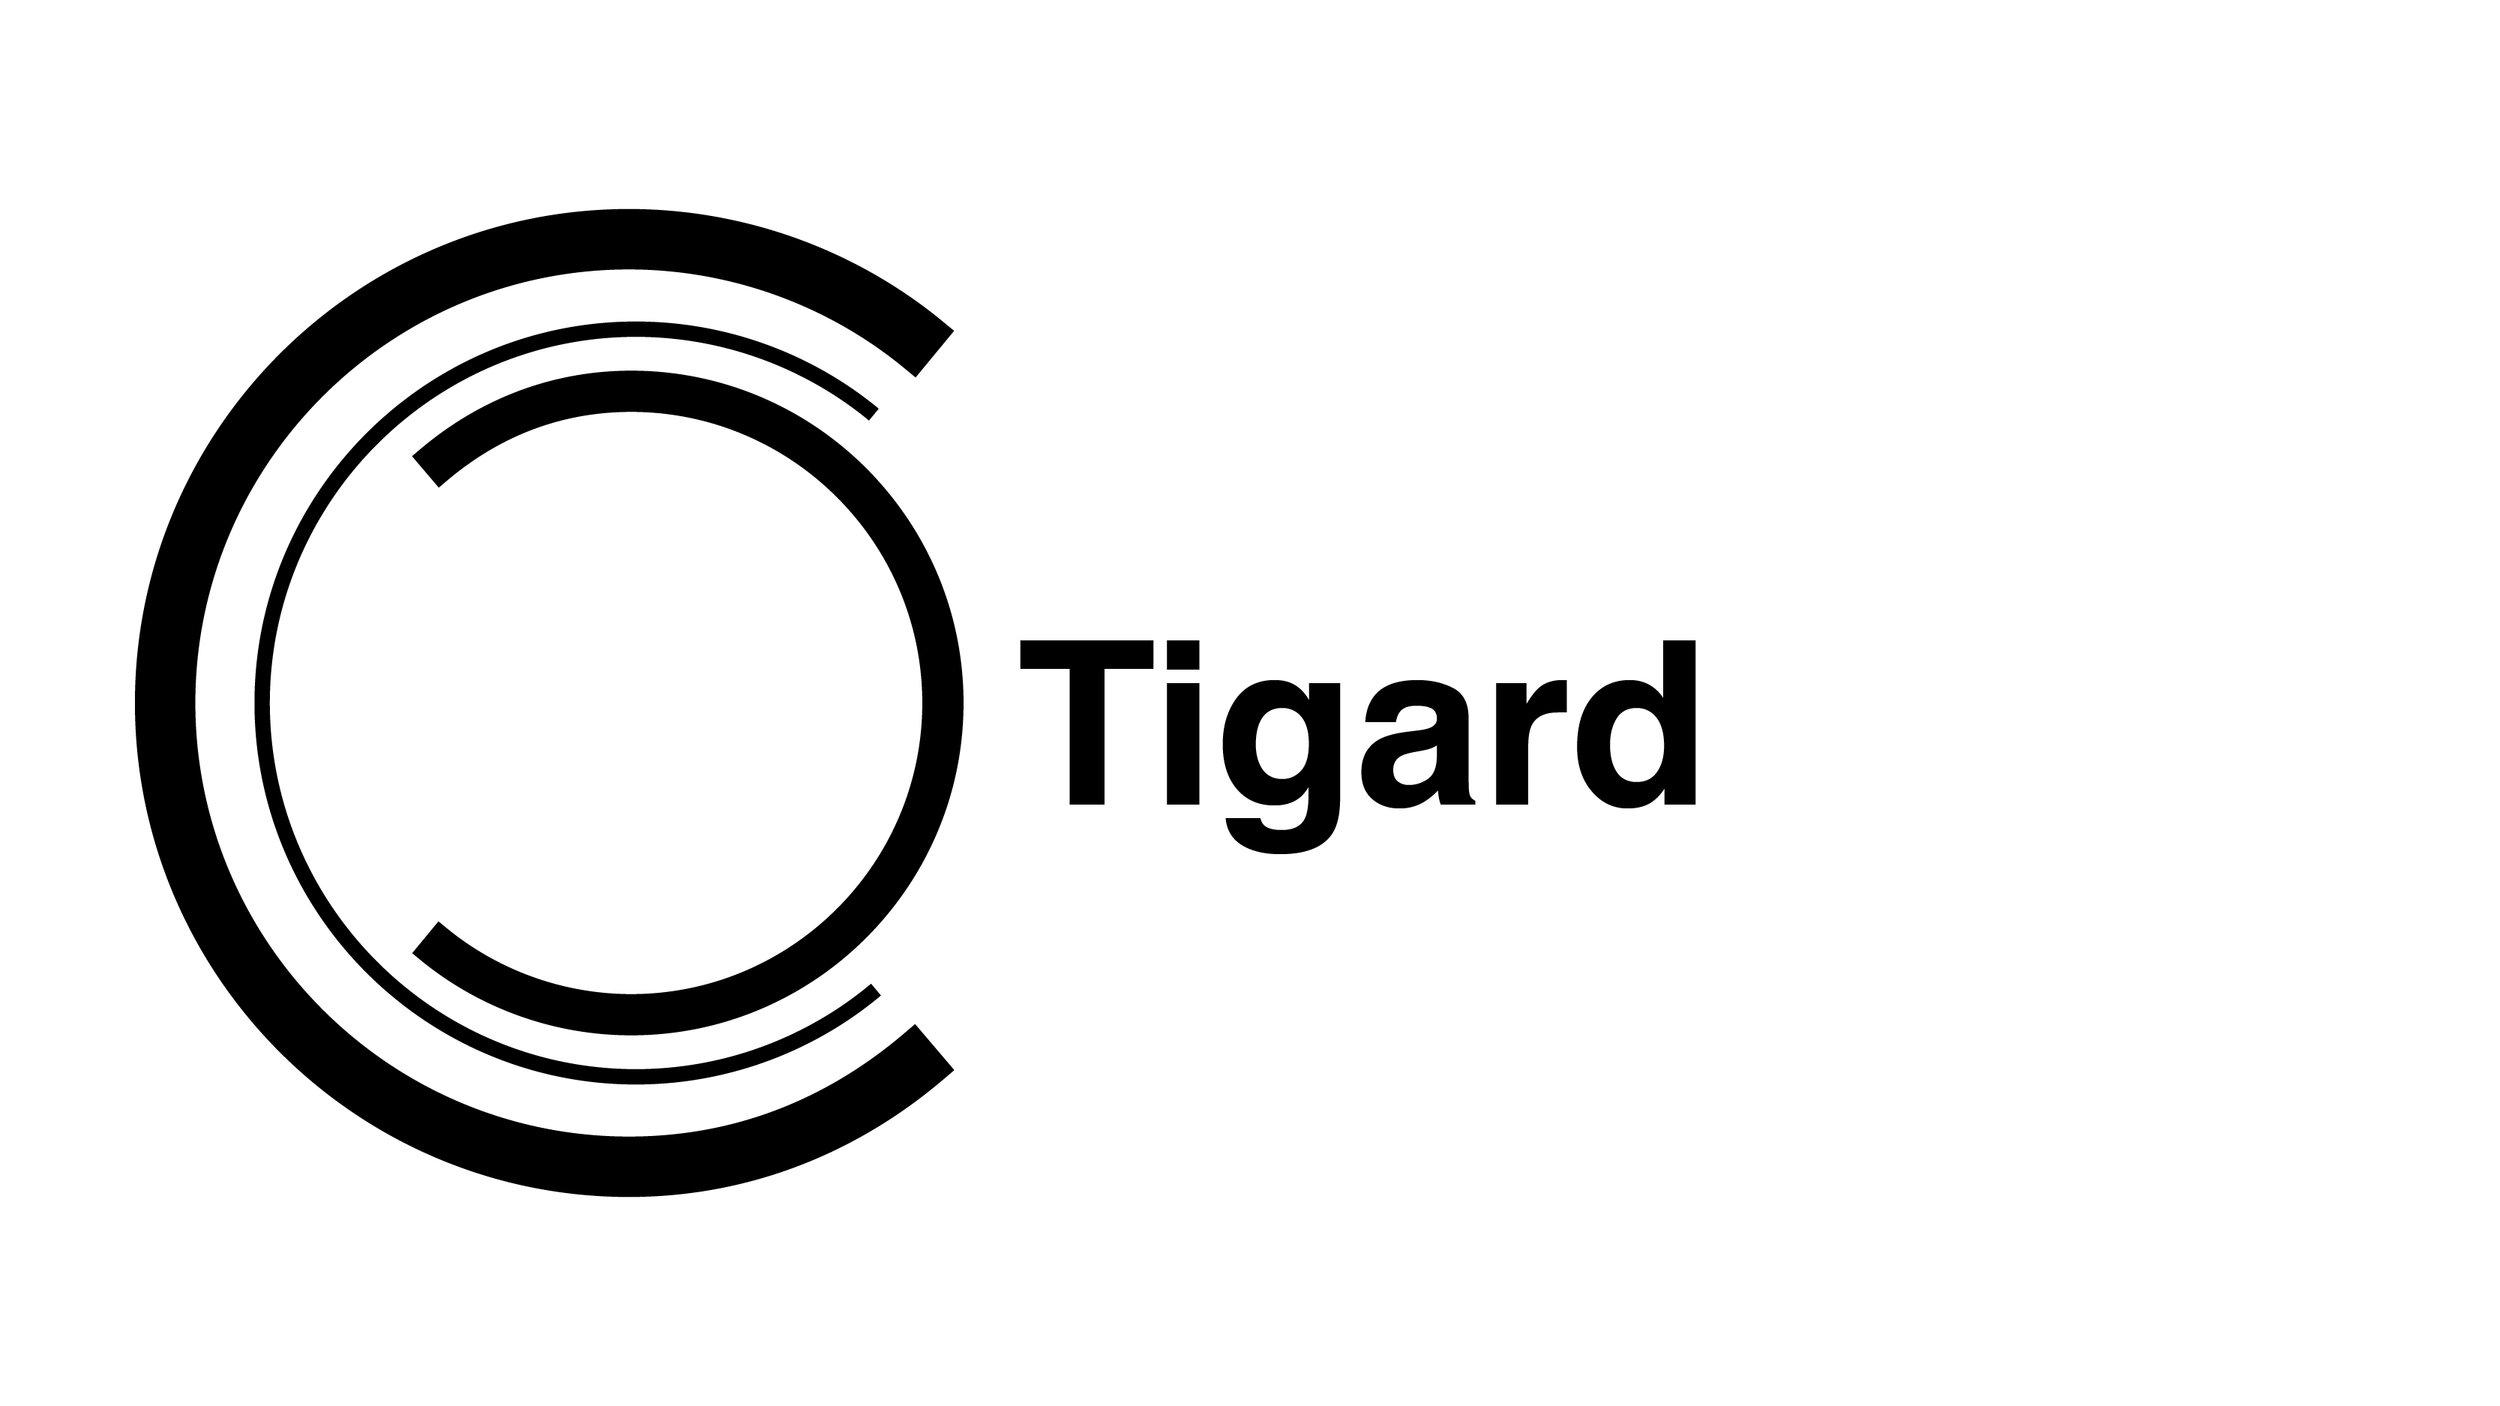 TigardLogo.jpg